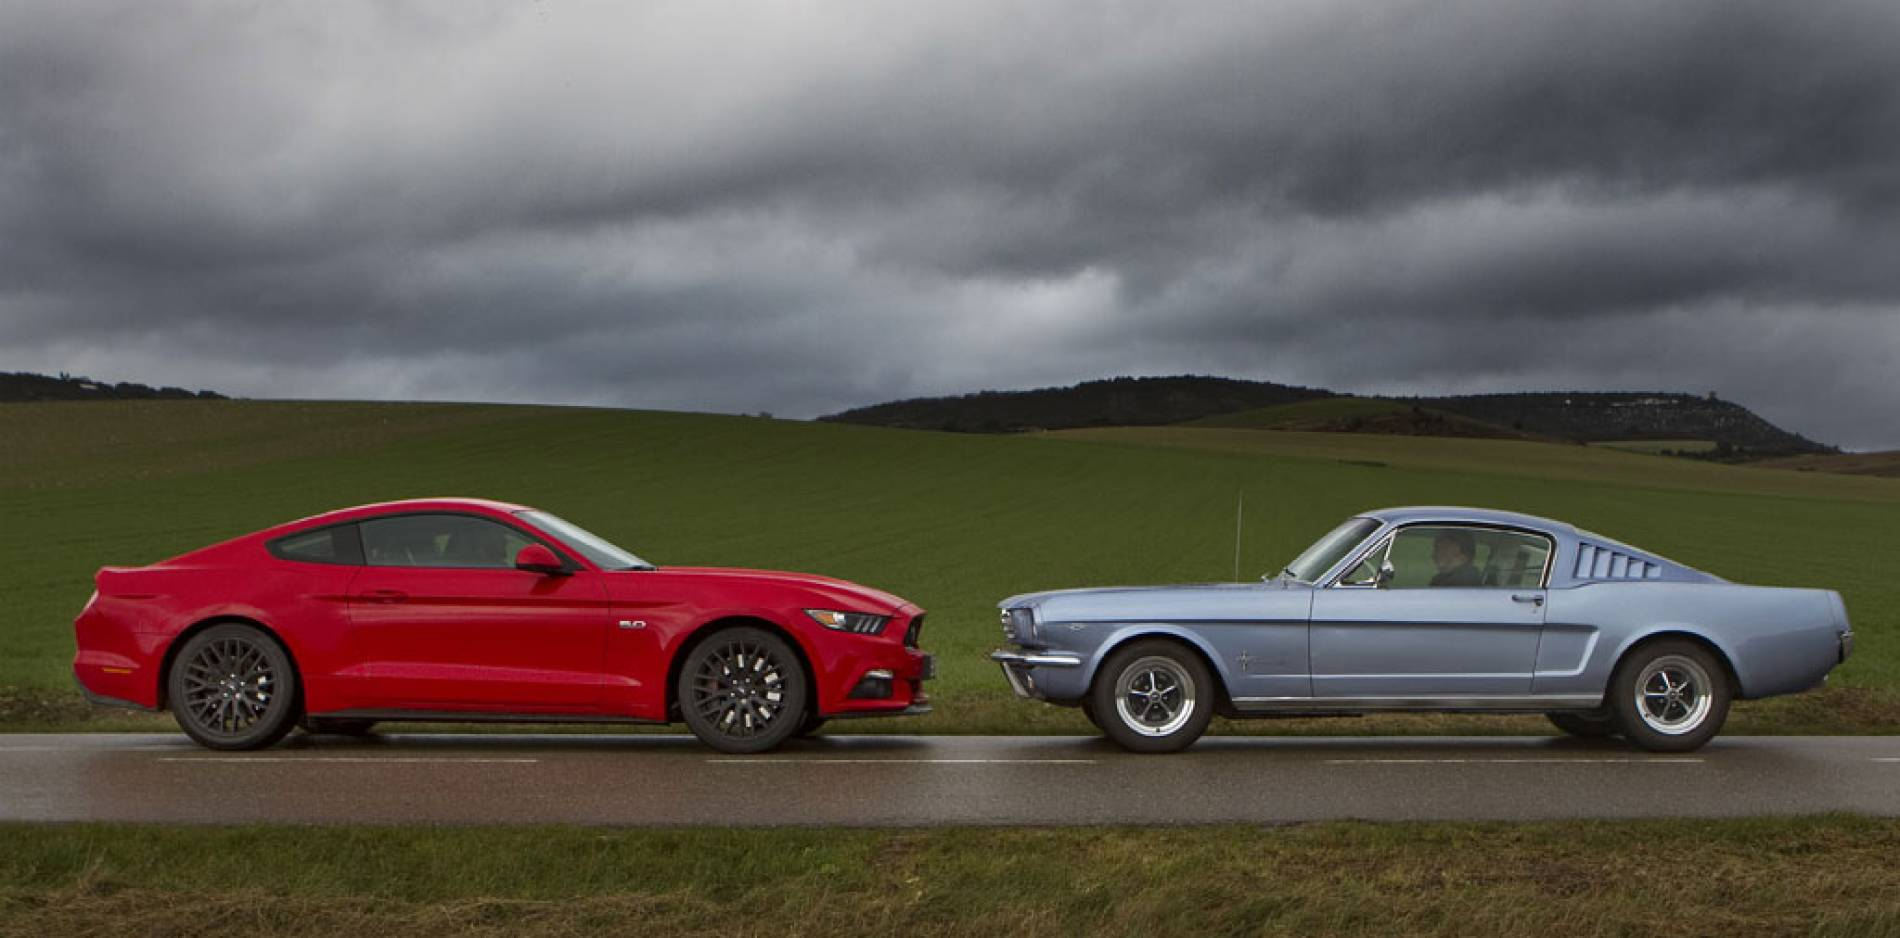 Prueba Ford Mustang GT 5.0 V8 de 421 CV: Vuelta a los orígenes